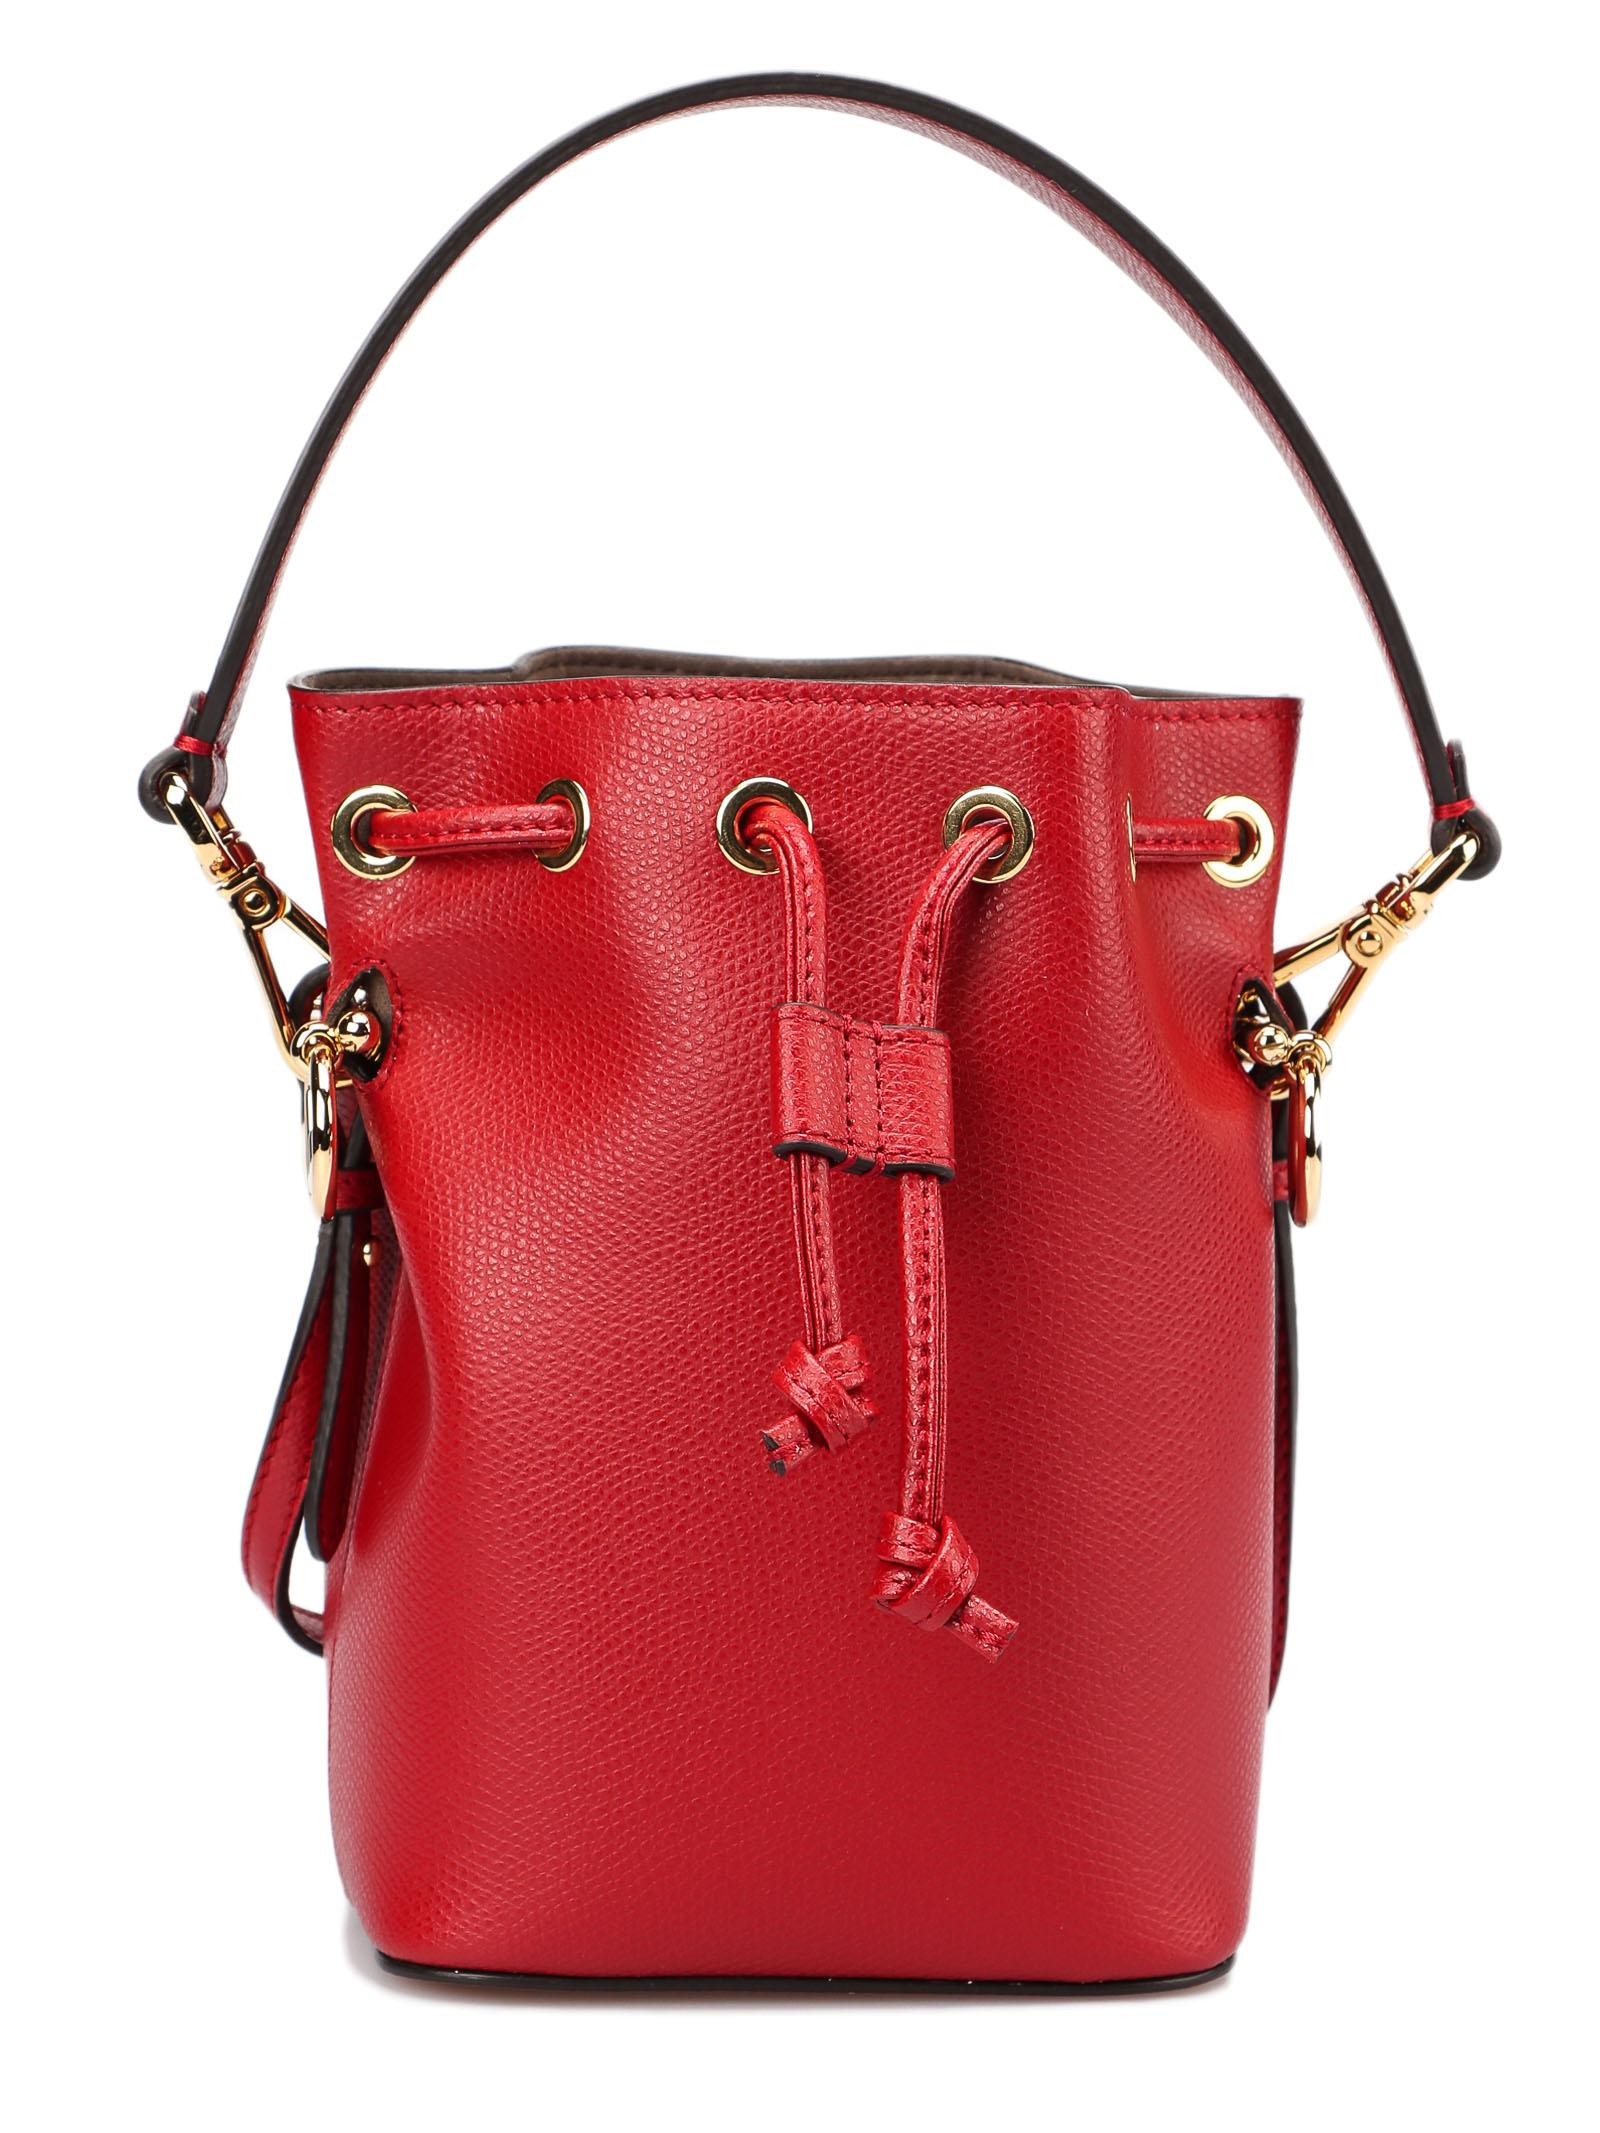 a85ba8e0500a Lyst - Fendi Mon Tresor Mini Bag in Red